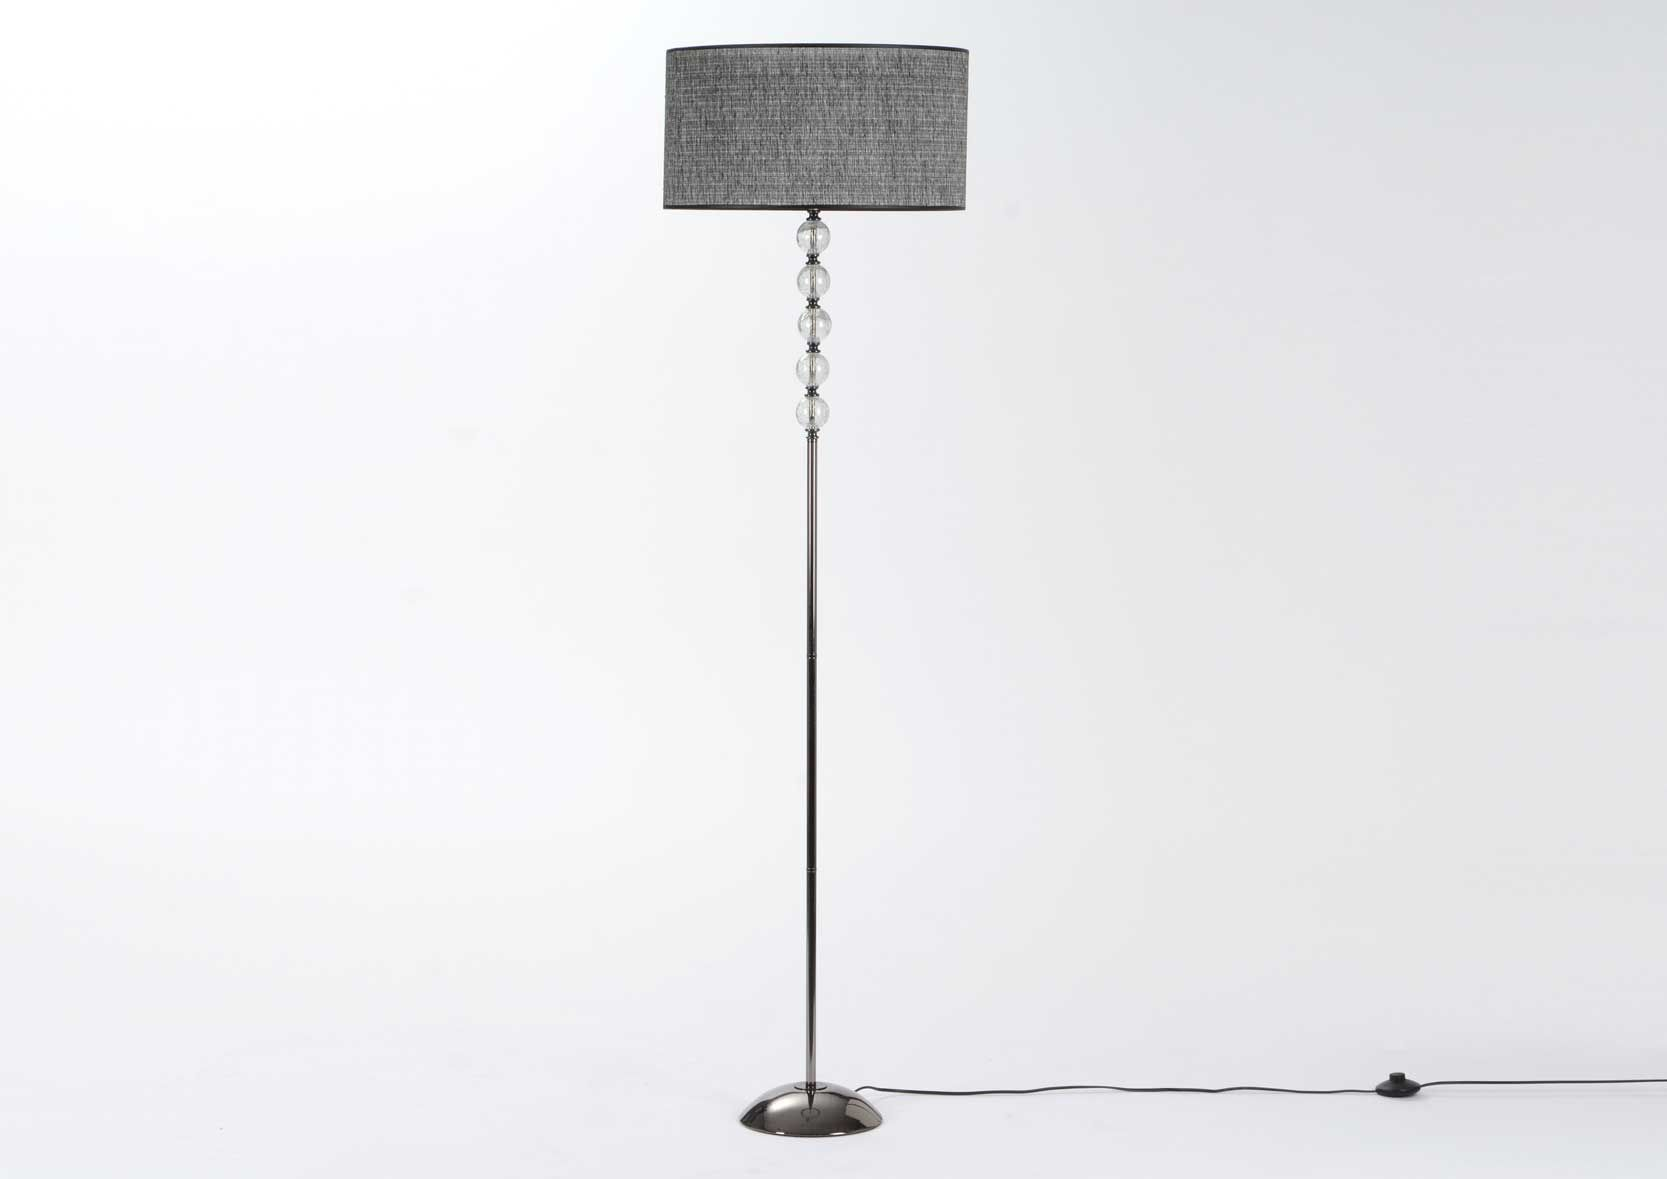 Lampe design noir Louis Verre et metal pu(r) Amadeus